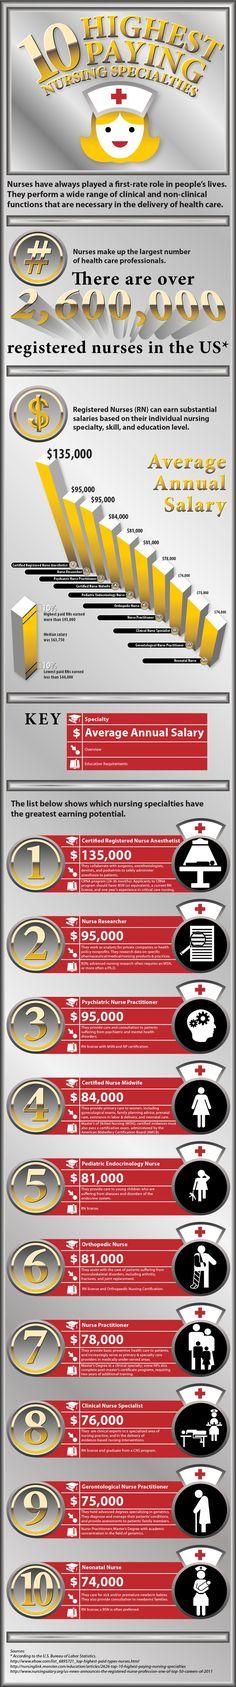 nurse practitioner - http://www.medicalfieldcareeroptions.com/howtobecomeanacutecarenursepractitioner.php